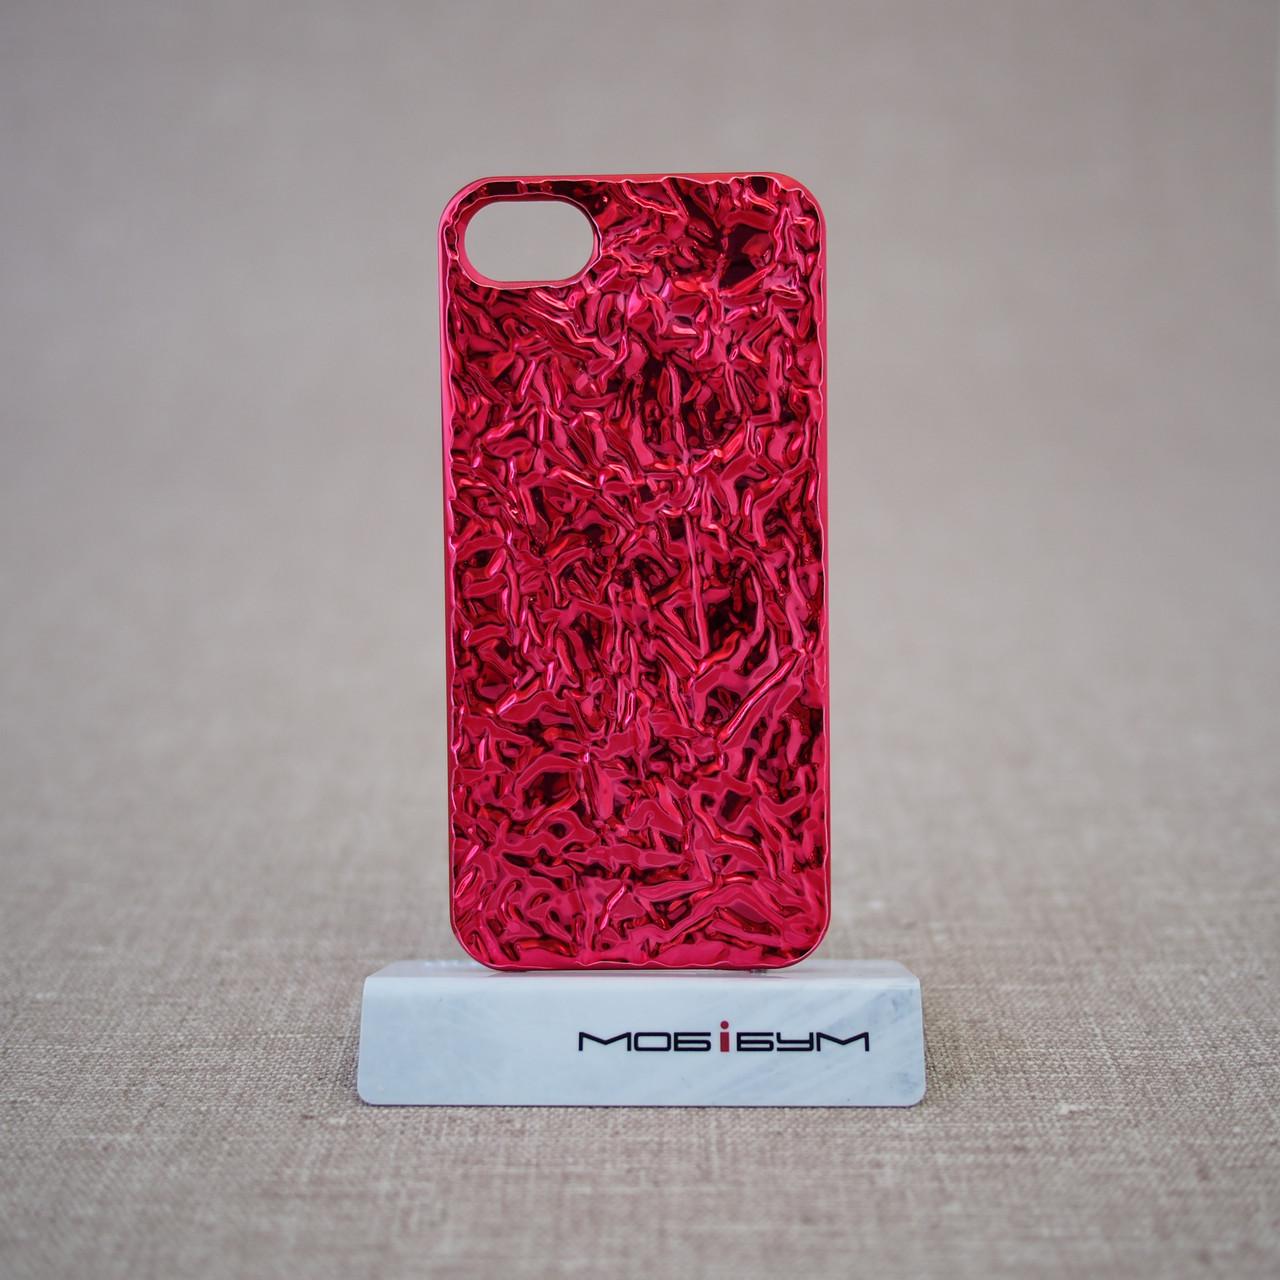 Чехол MARC JACOBS Fashion Foil iPhone 5s/SE red (MJ-FOIL-REDD)